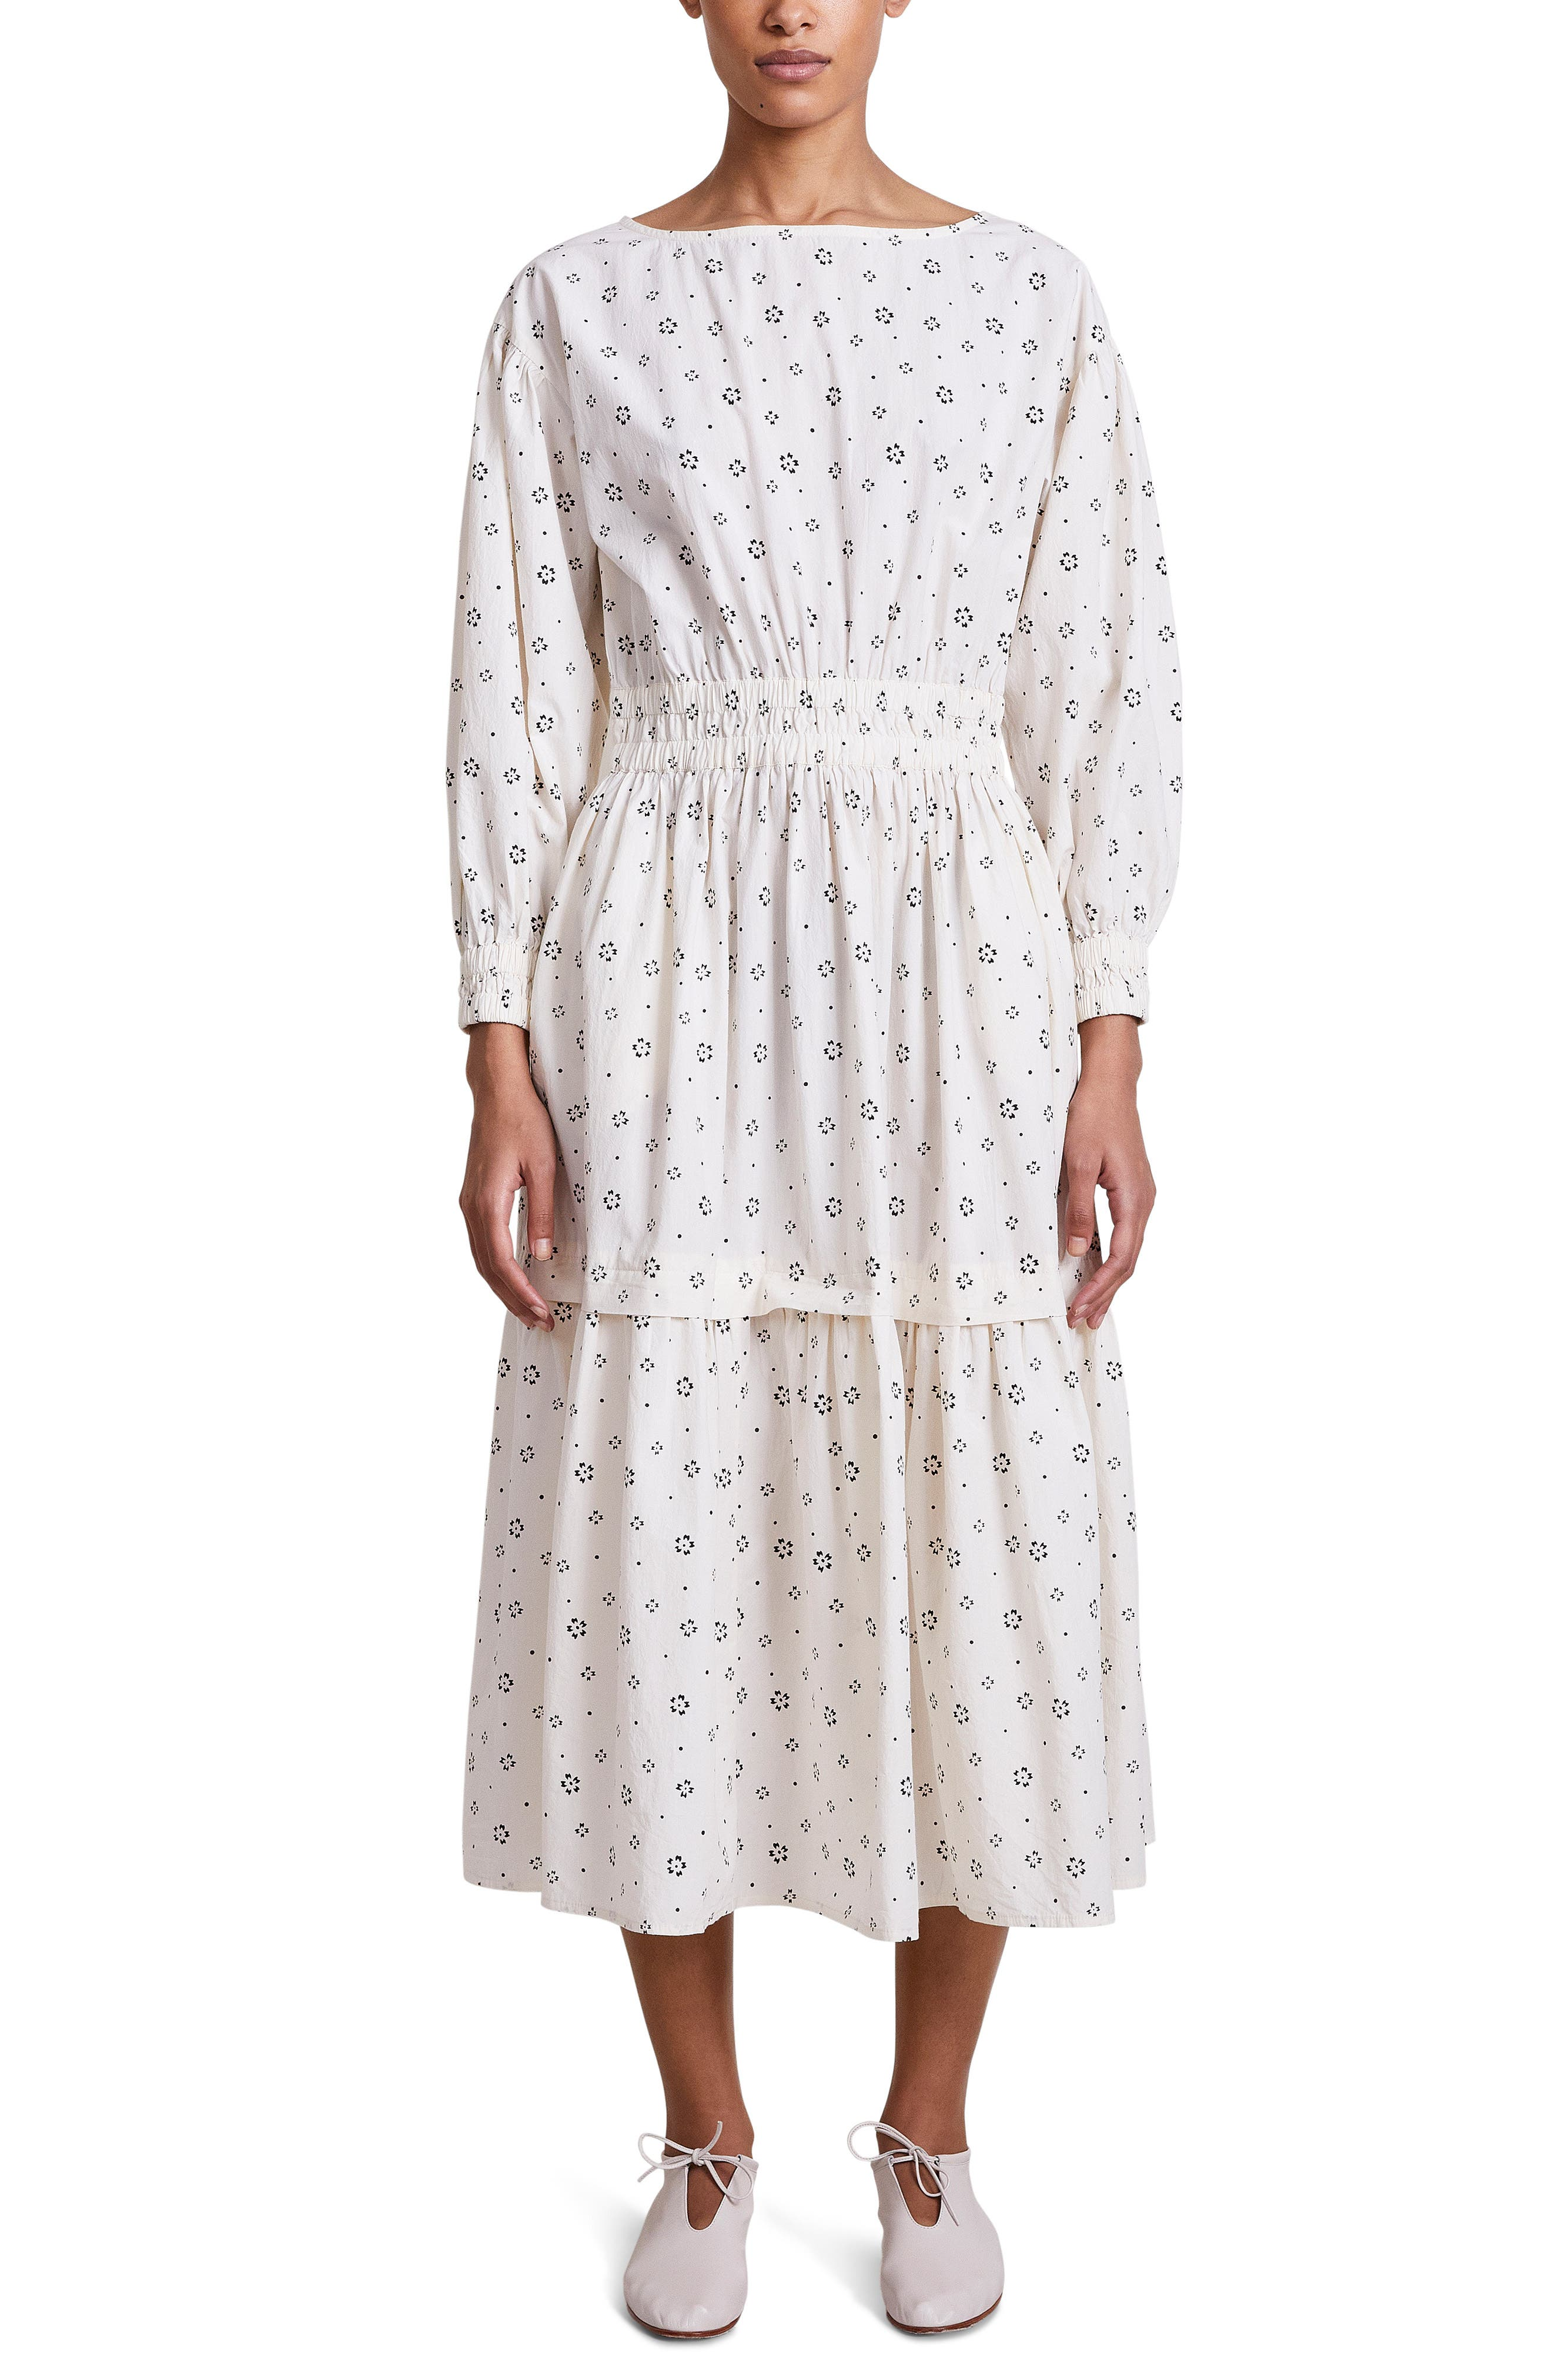 Estrella Floral Long Sleeve Tiered Organic Cotton Dress